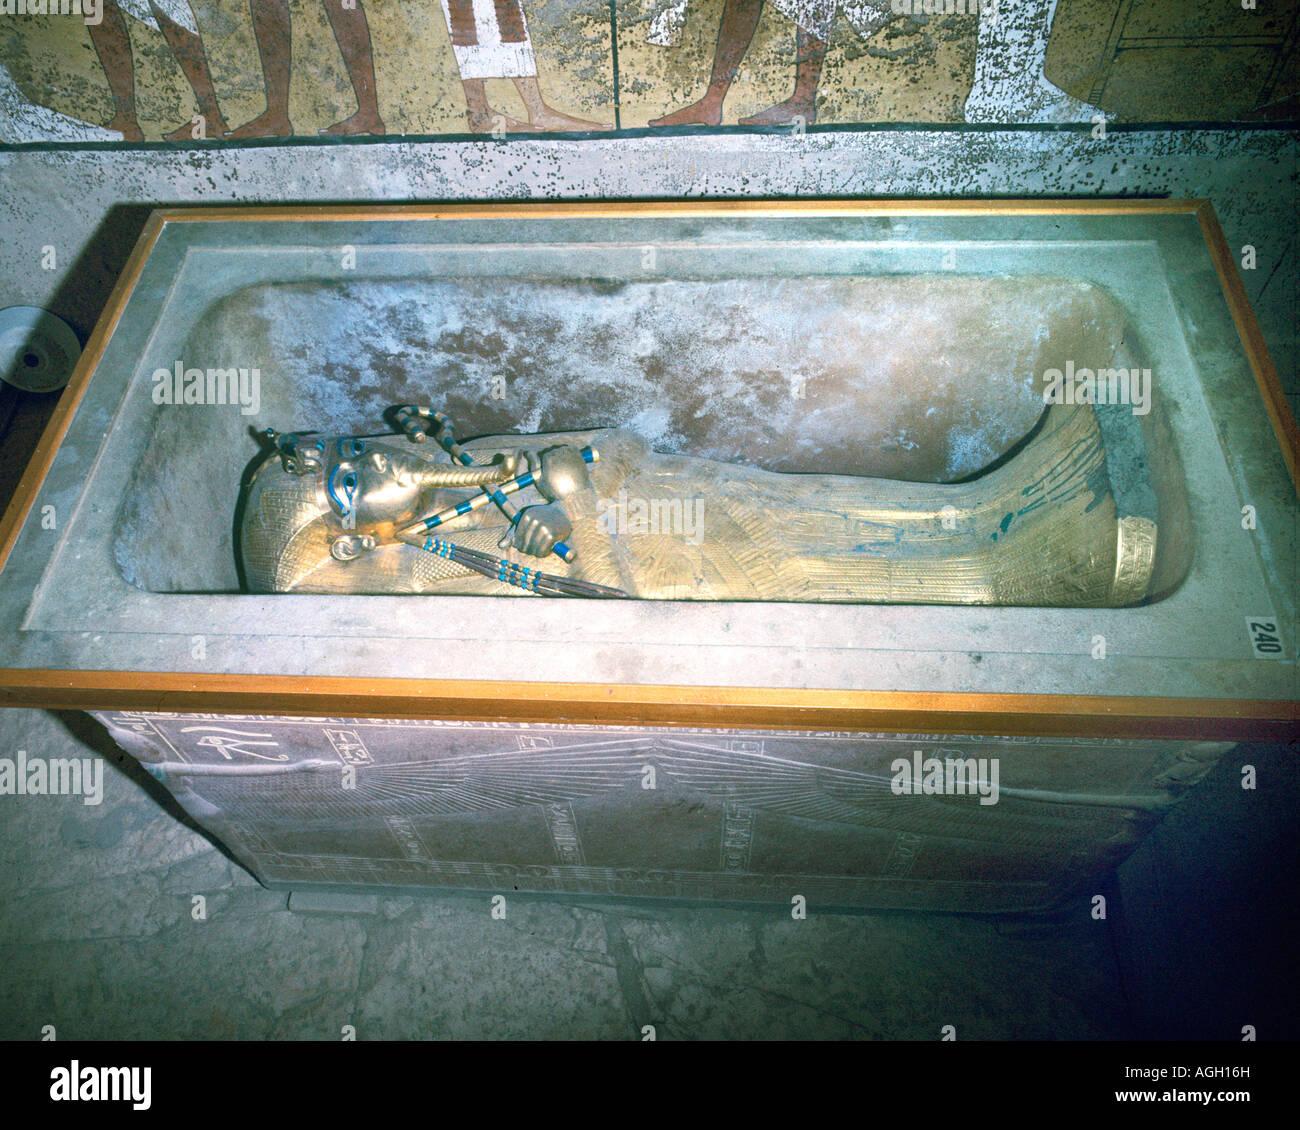 Tutankhamun sarcophagus - Stock Image